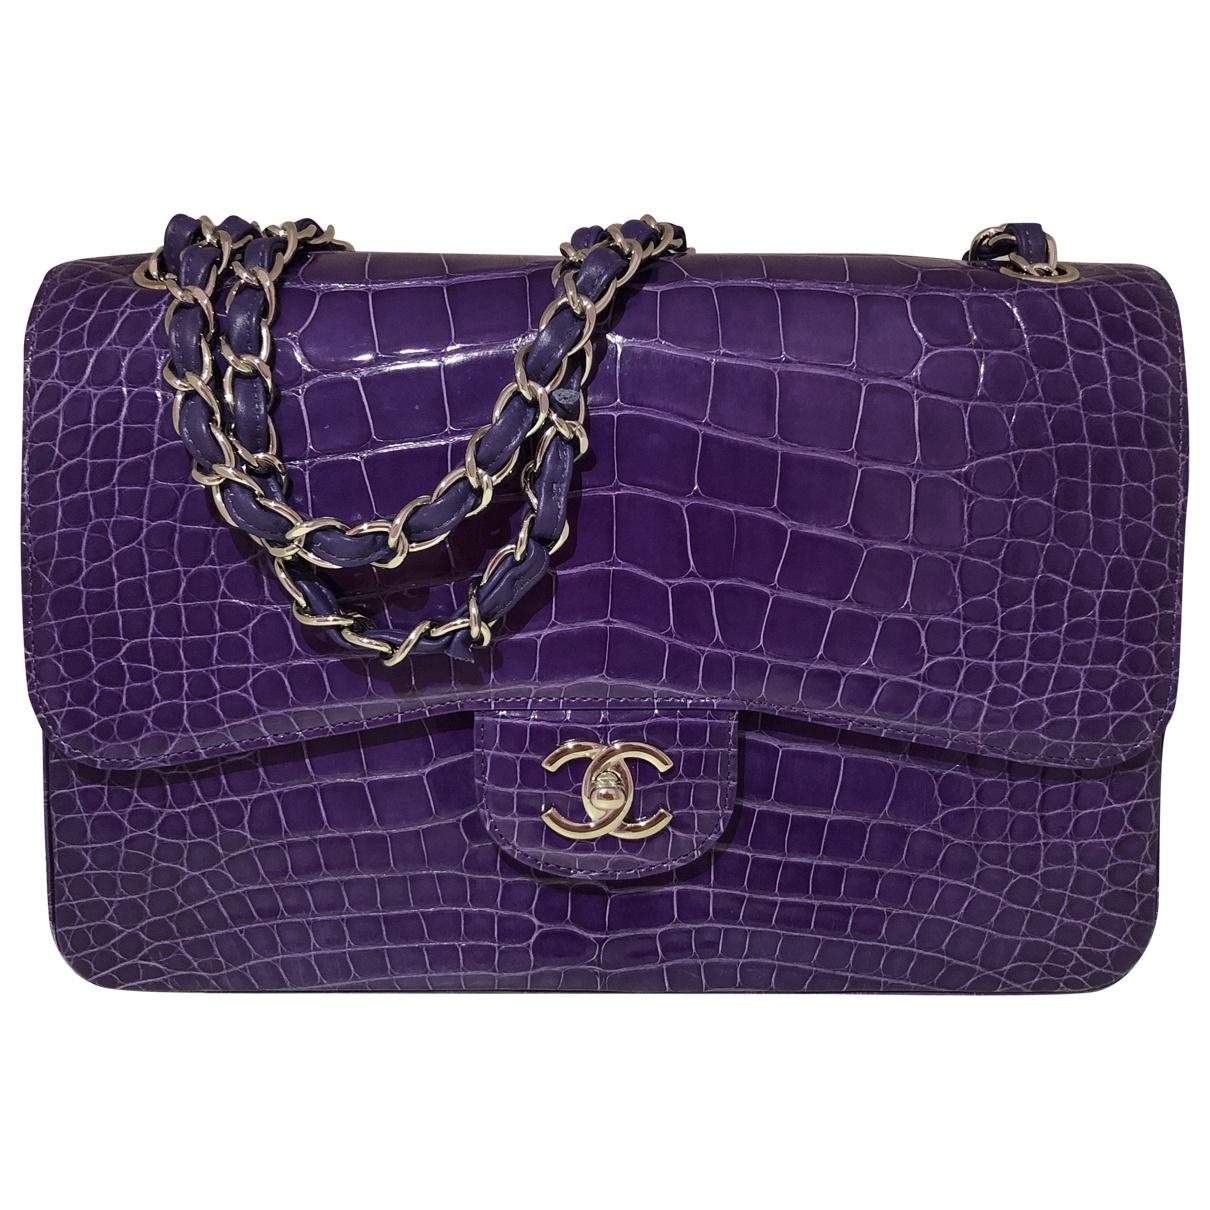 Chanel Timeless/Classique Handtasche in  Lila Aligator